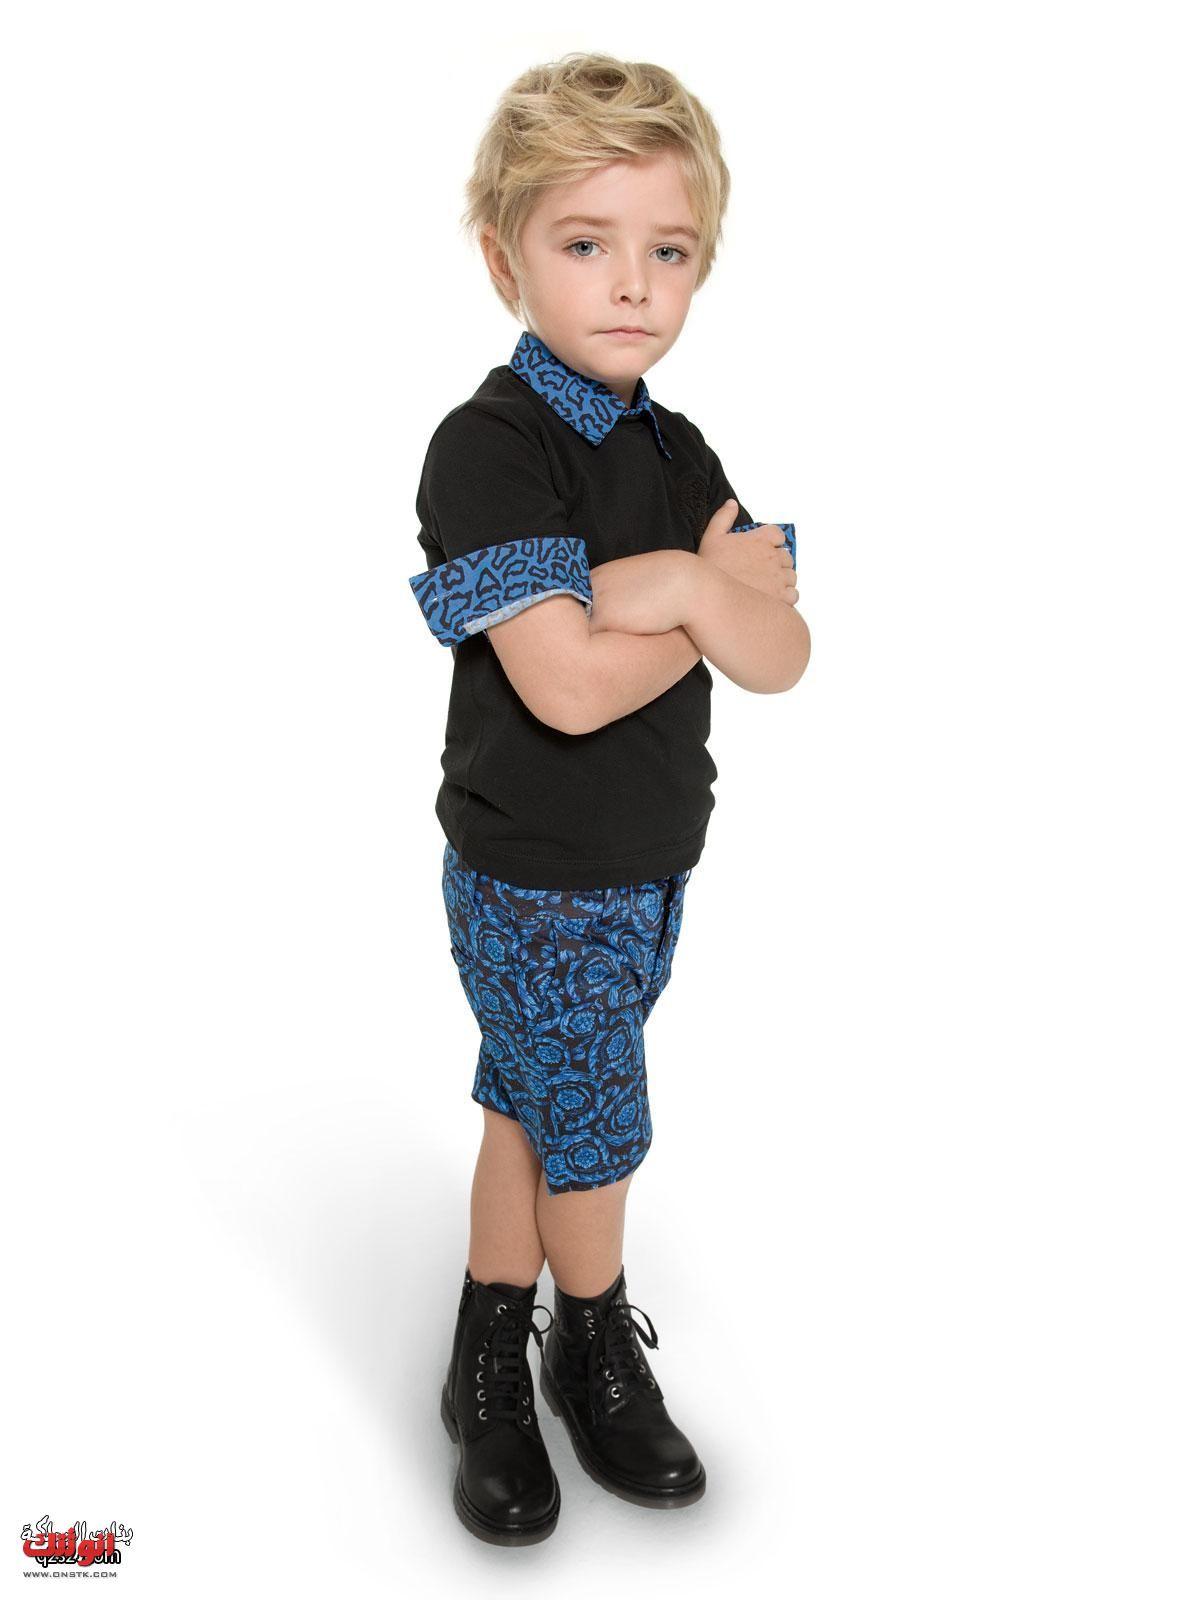 f53a6094c ملابس اطفال للبيع , تريدي ملابس لطفلك اليك اجمل ملابس الاطفال